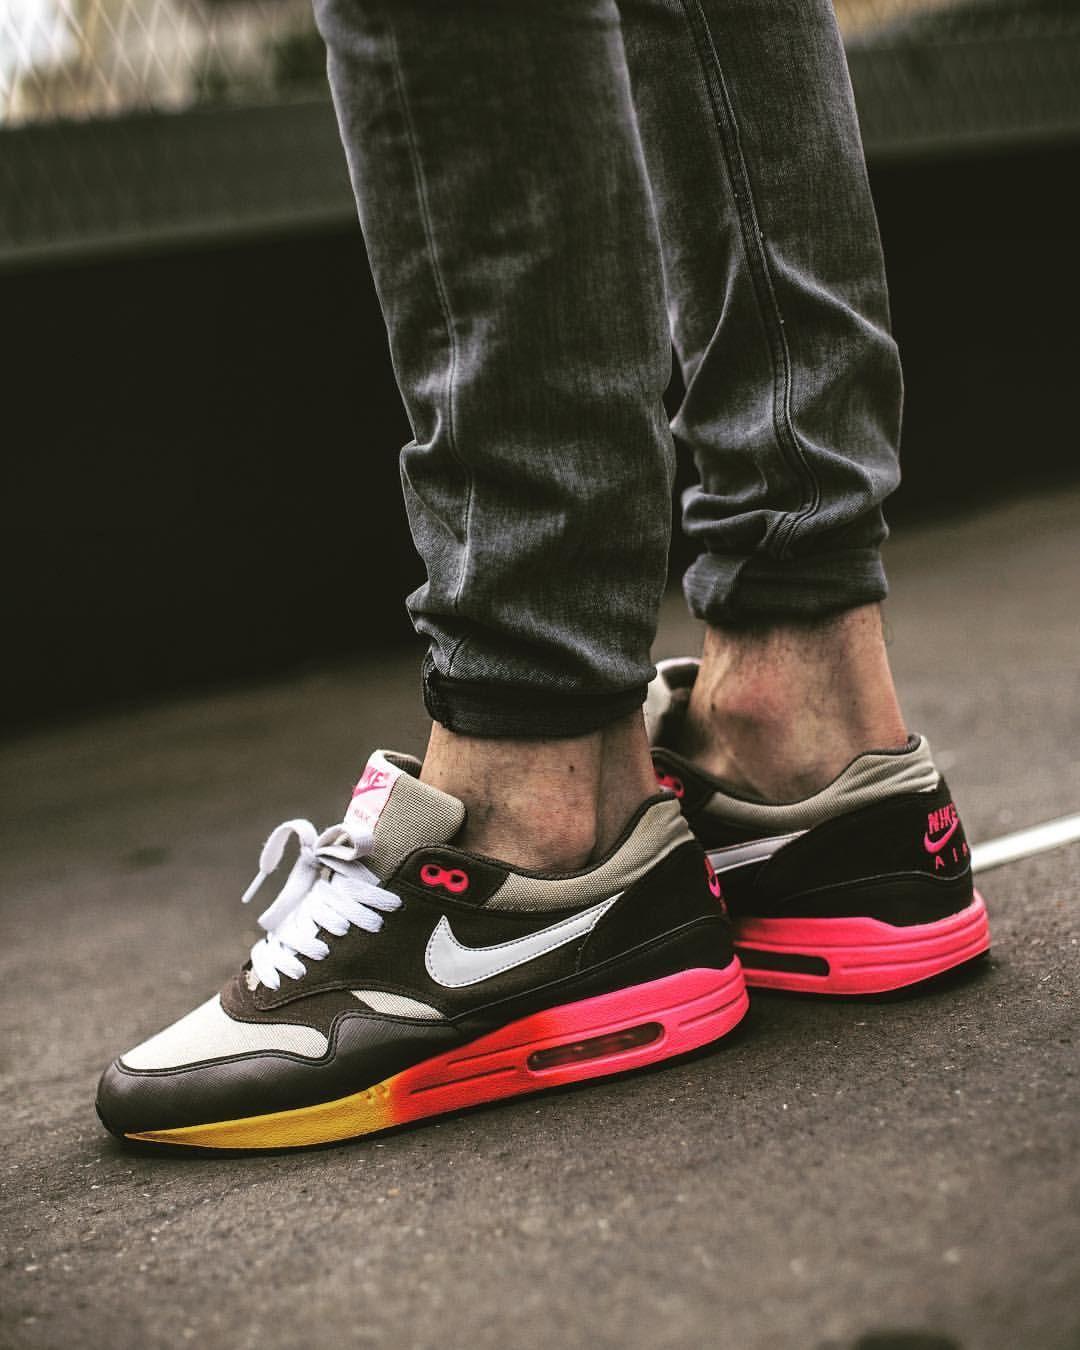 online retailer f32b6 7d86d Nike Air Max 1